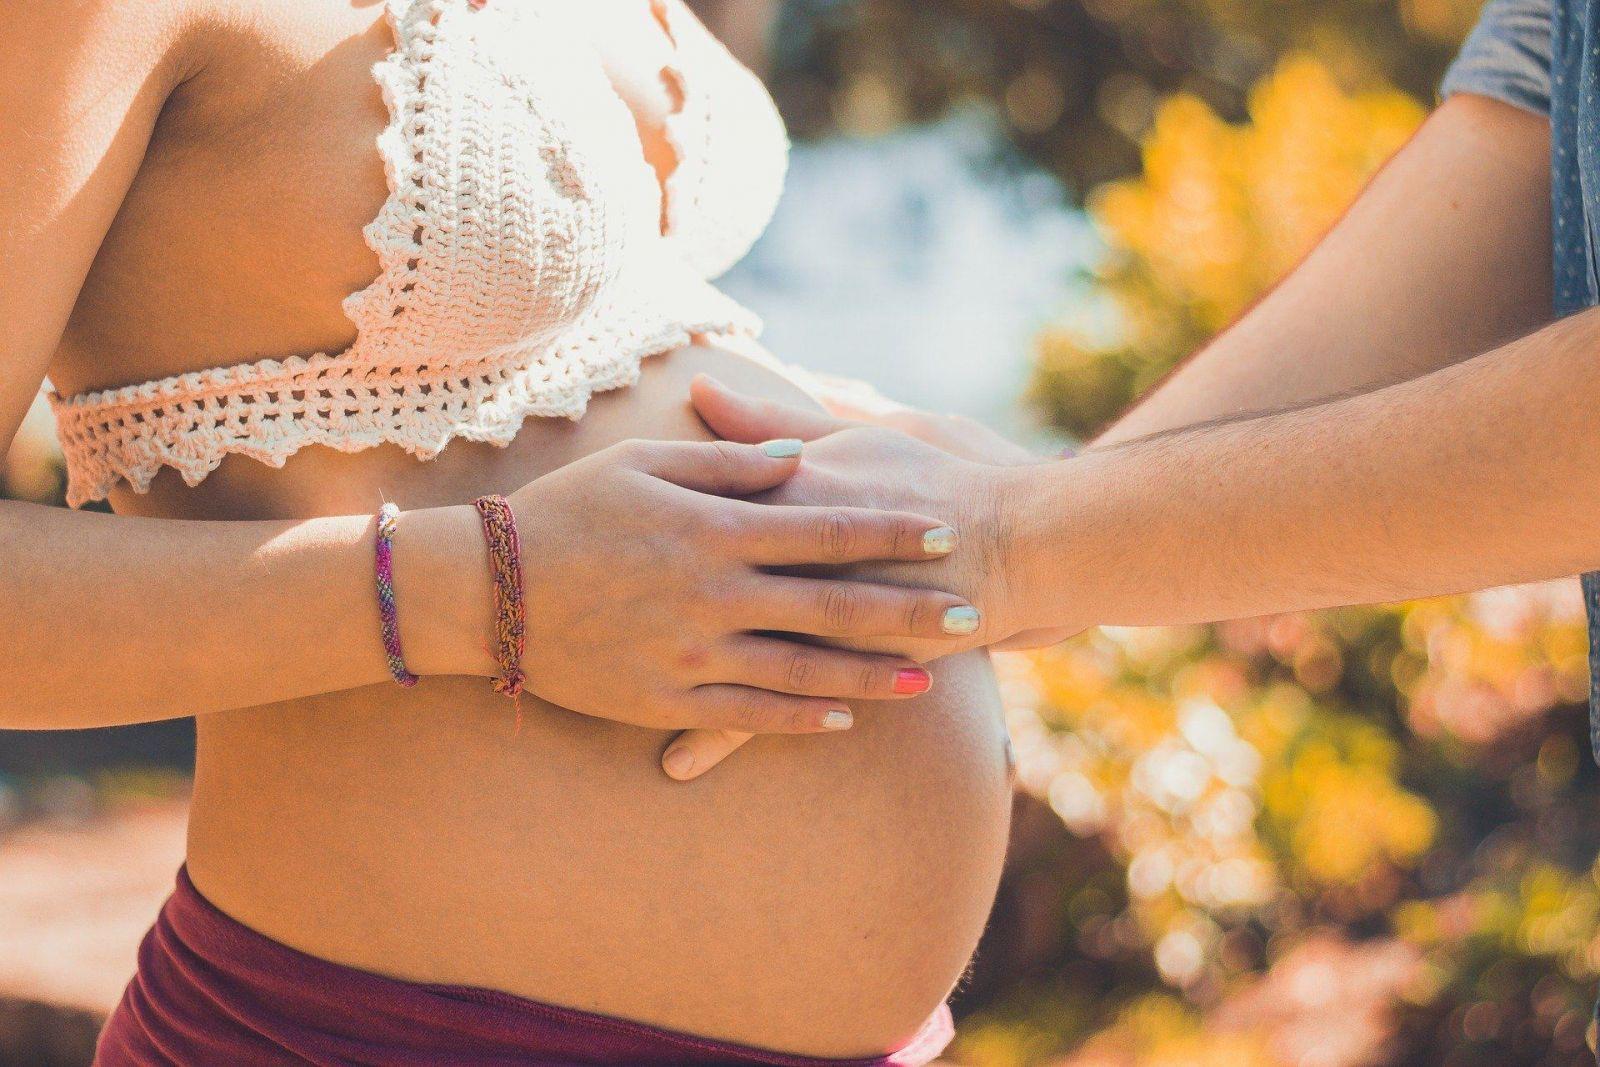 Tehotenstvo acukrovka